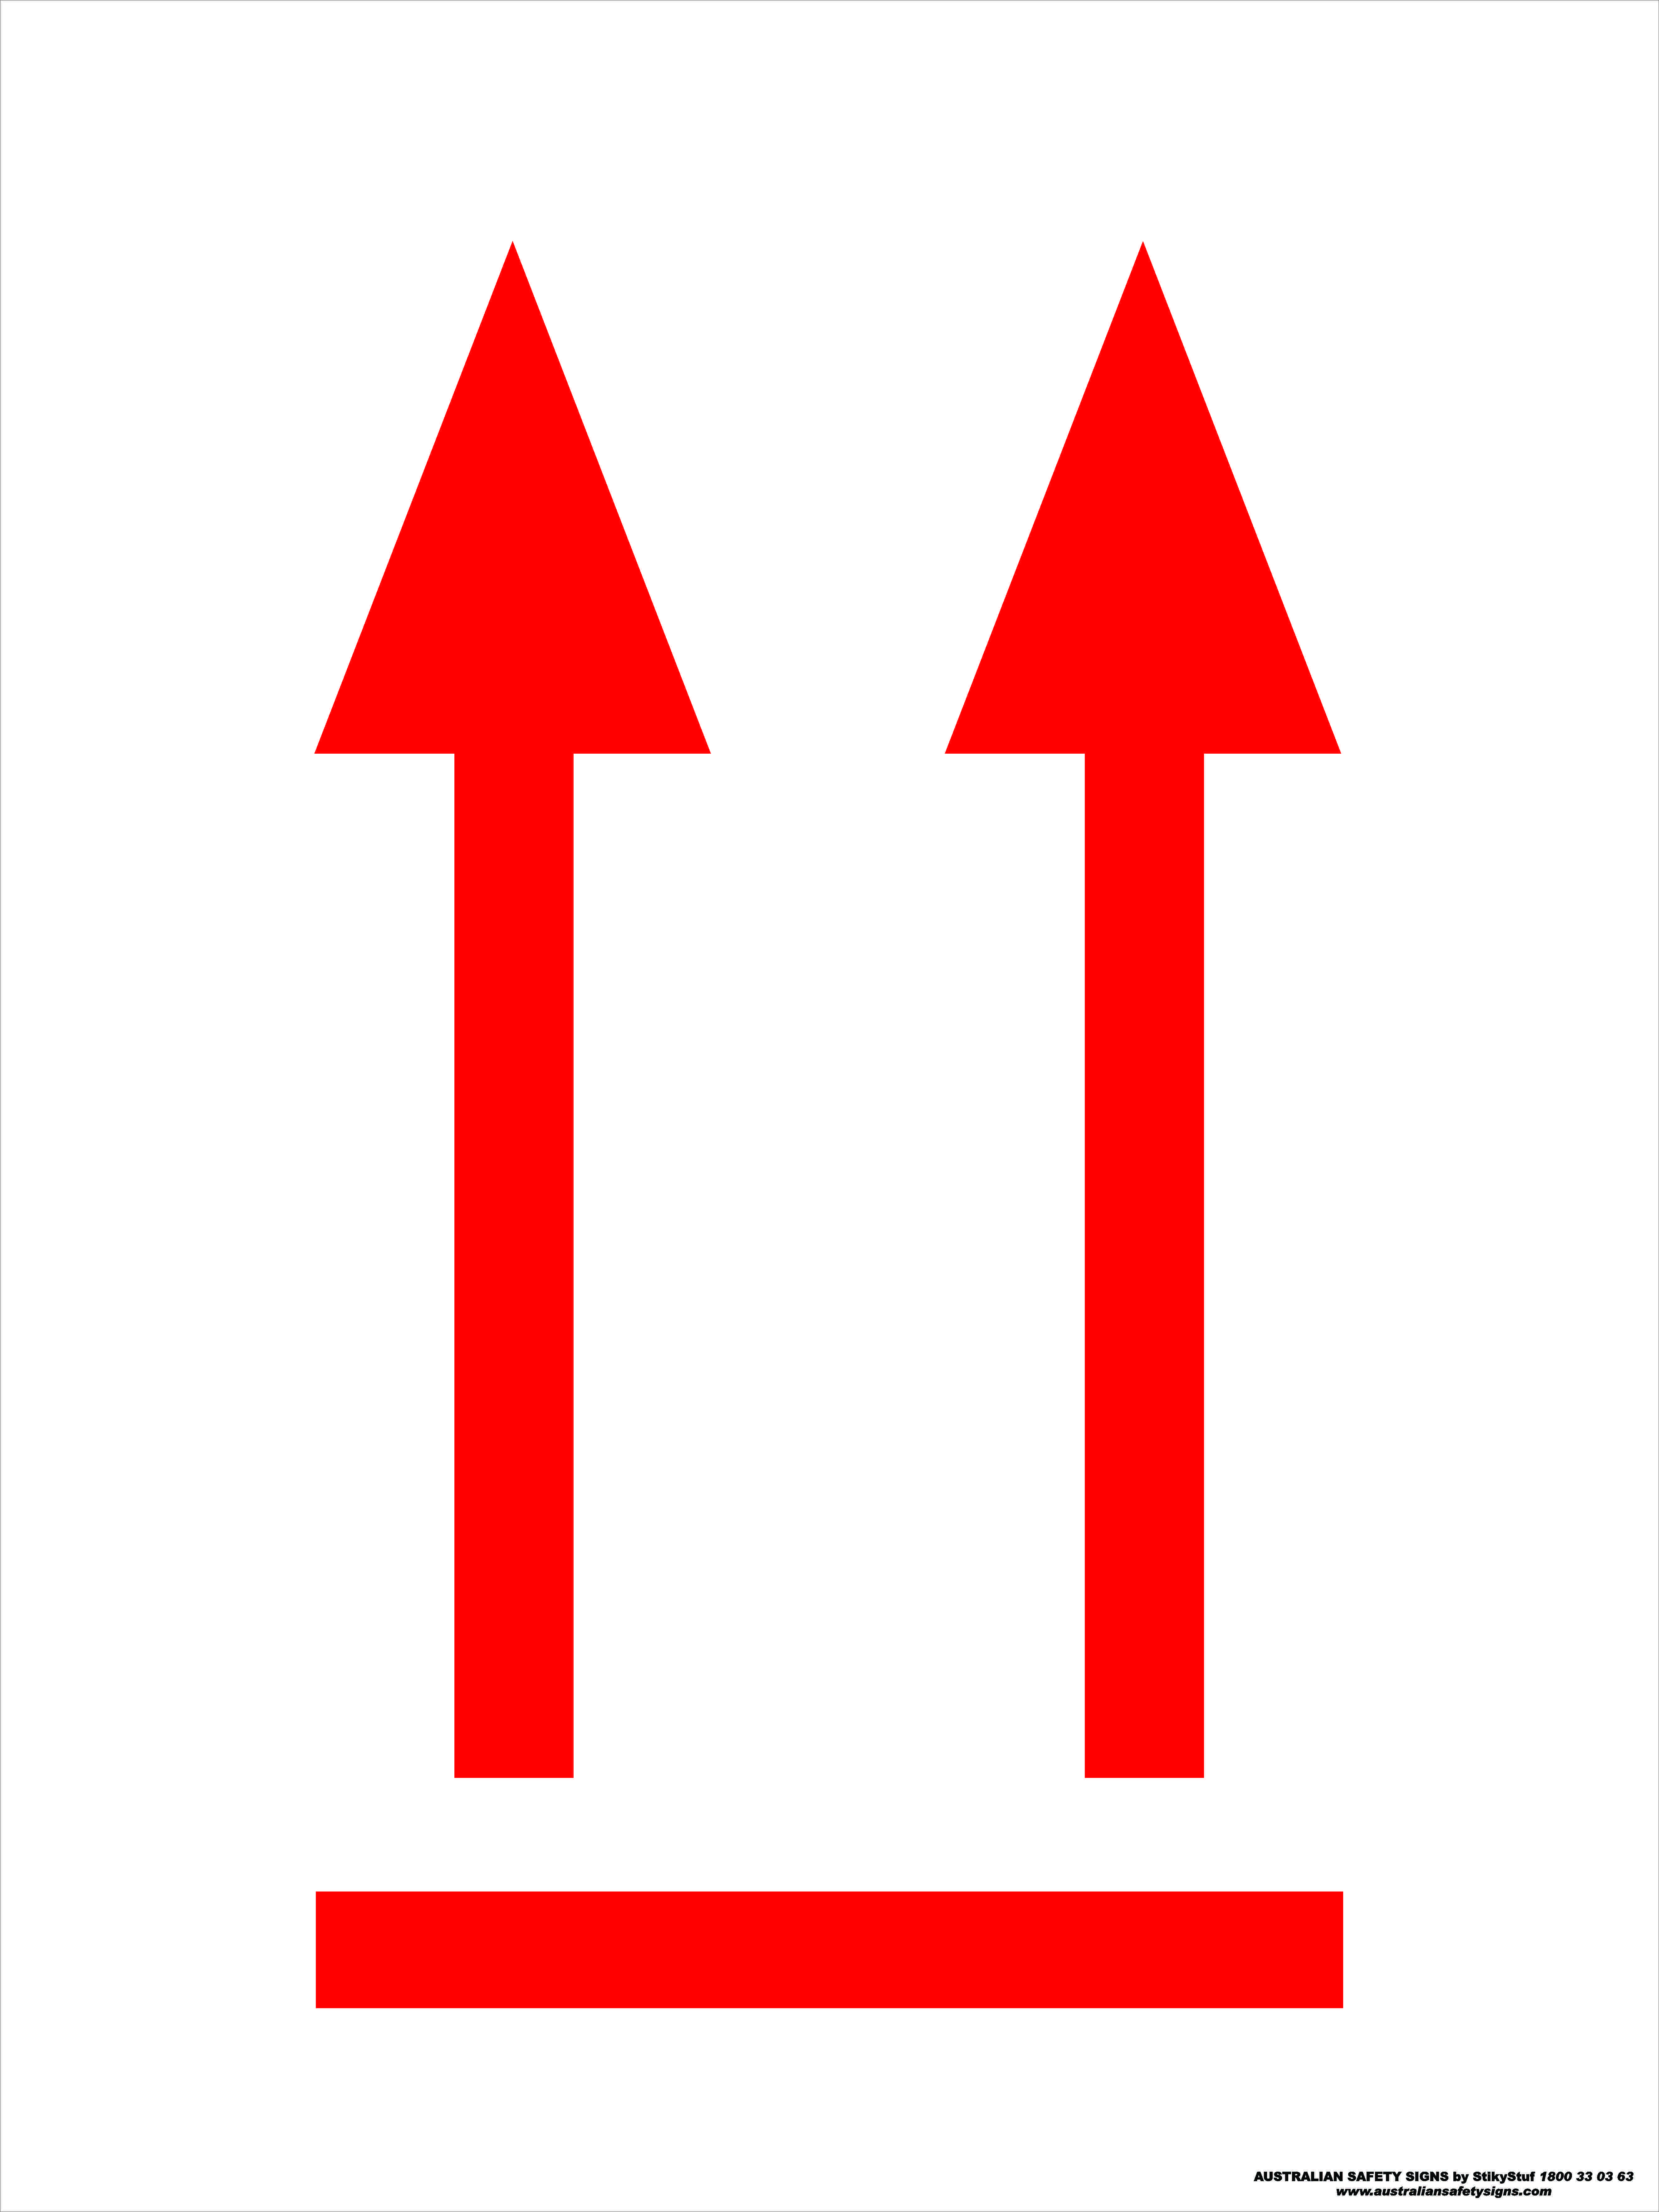 Hazchem Signs ORIENTATION ARROWS 1 - RED